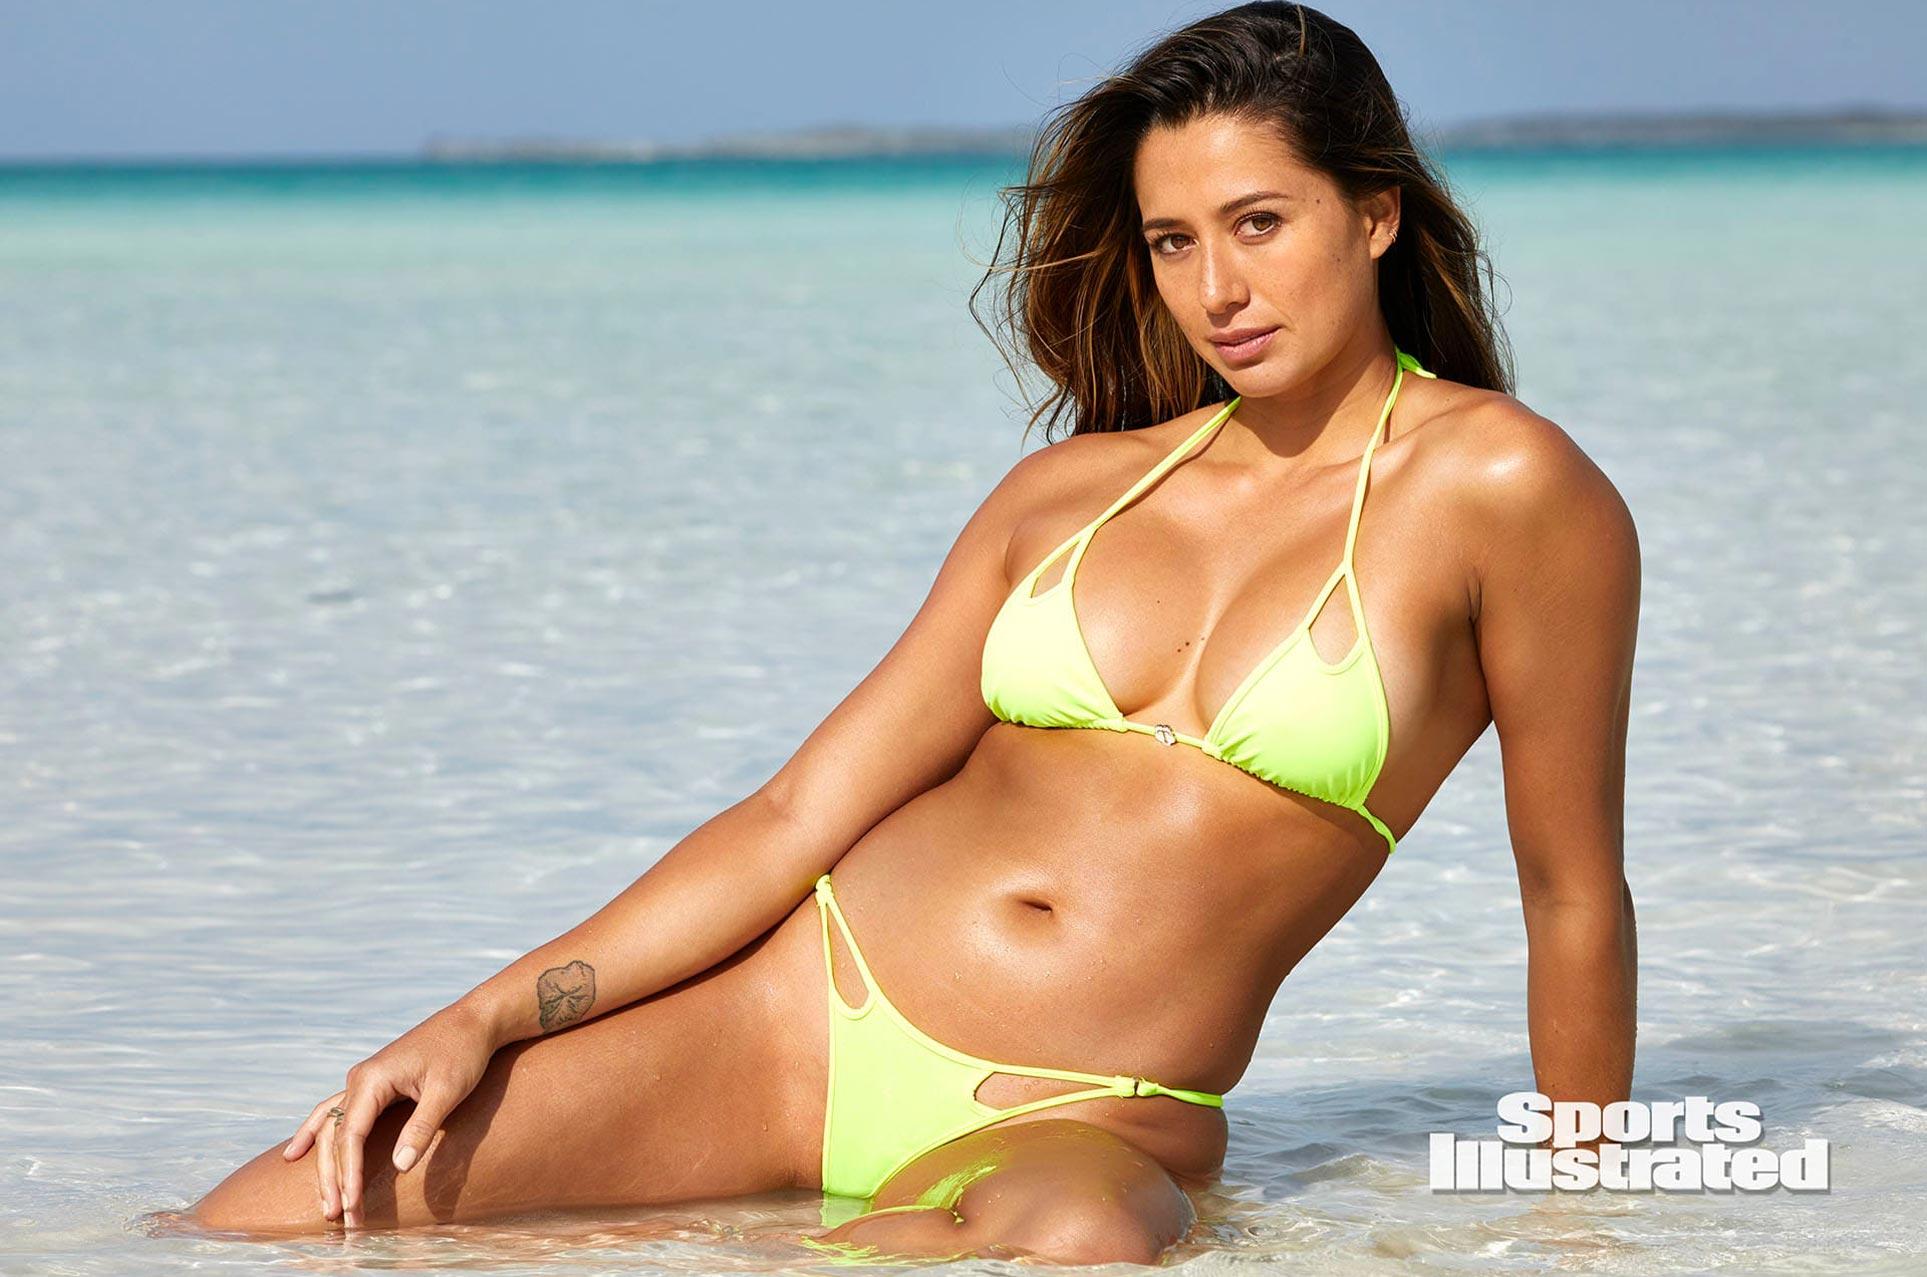 Малия Мануэль в каталоге купальников Sports Illustrated Swimsuit 2020 / фото 19